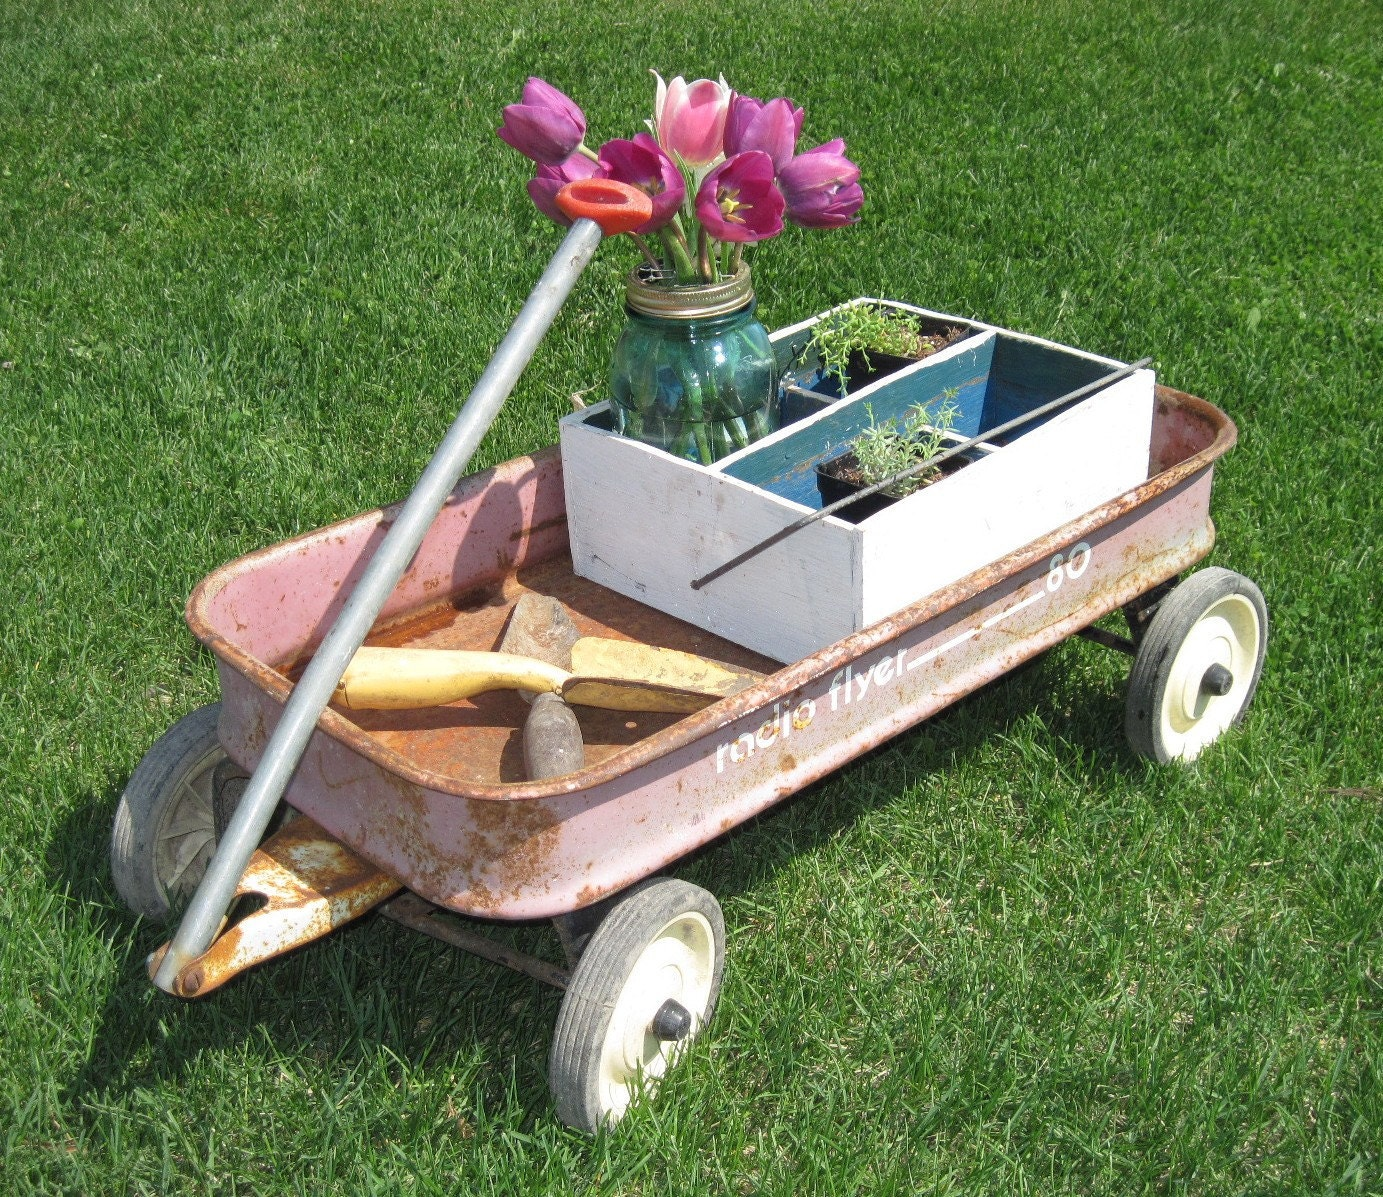 Metal Rustic Garden Decor Photograph | ... Wagon, Radio Flye